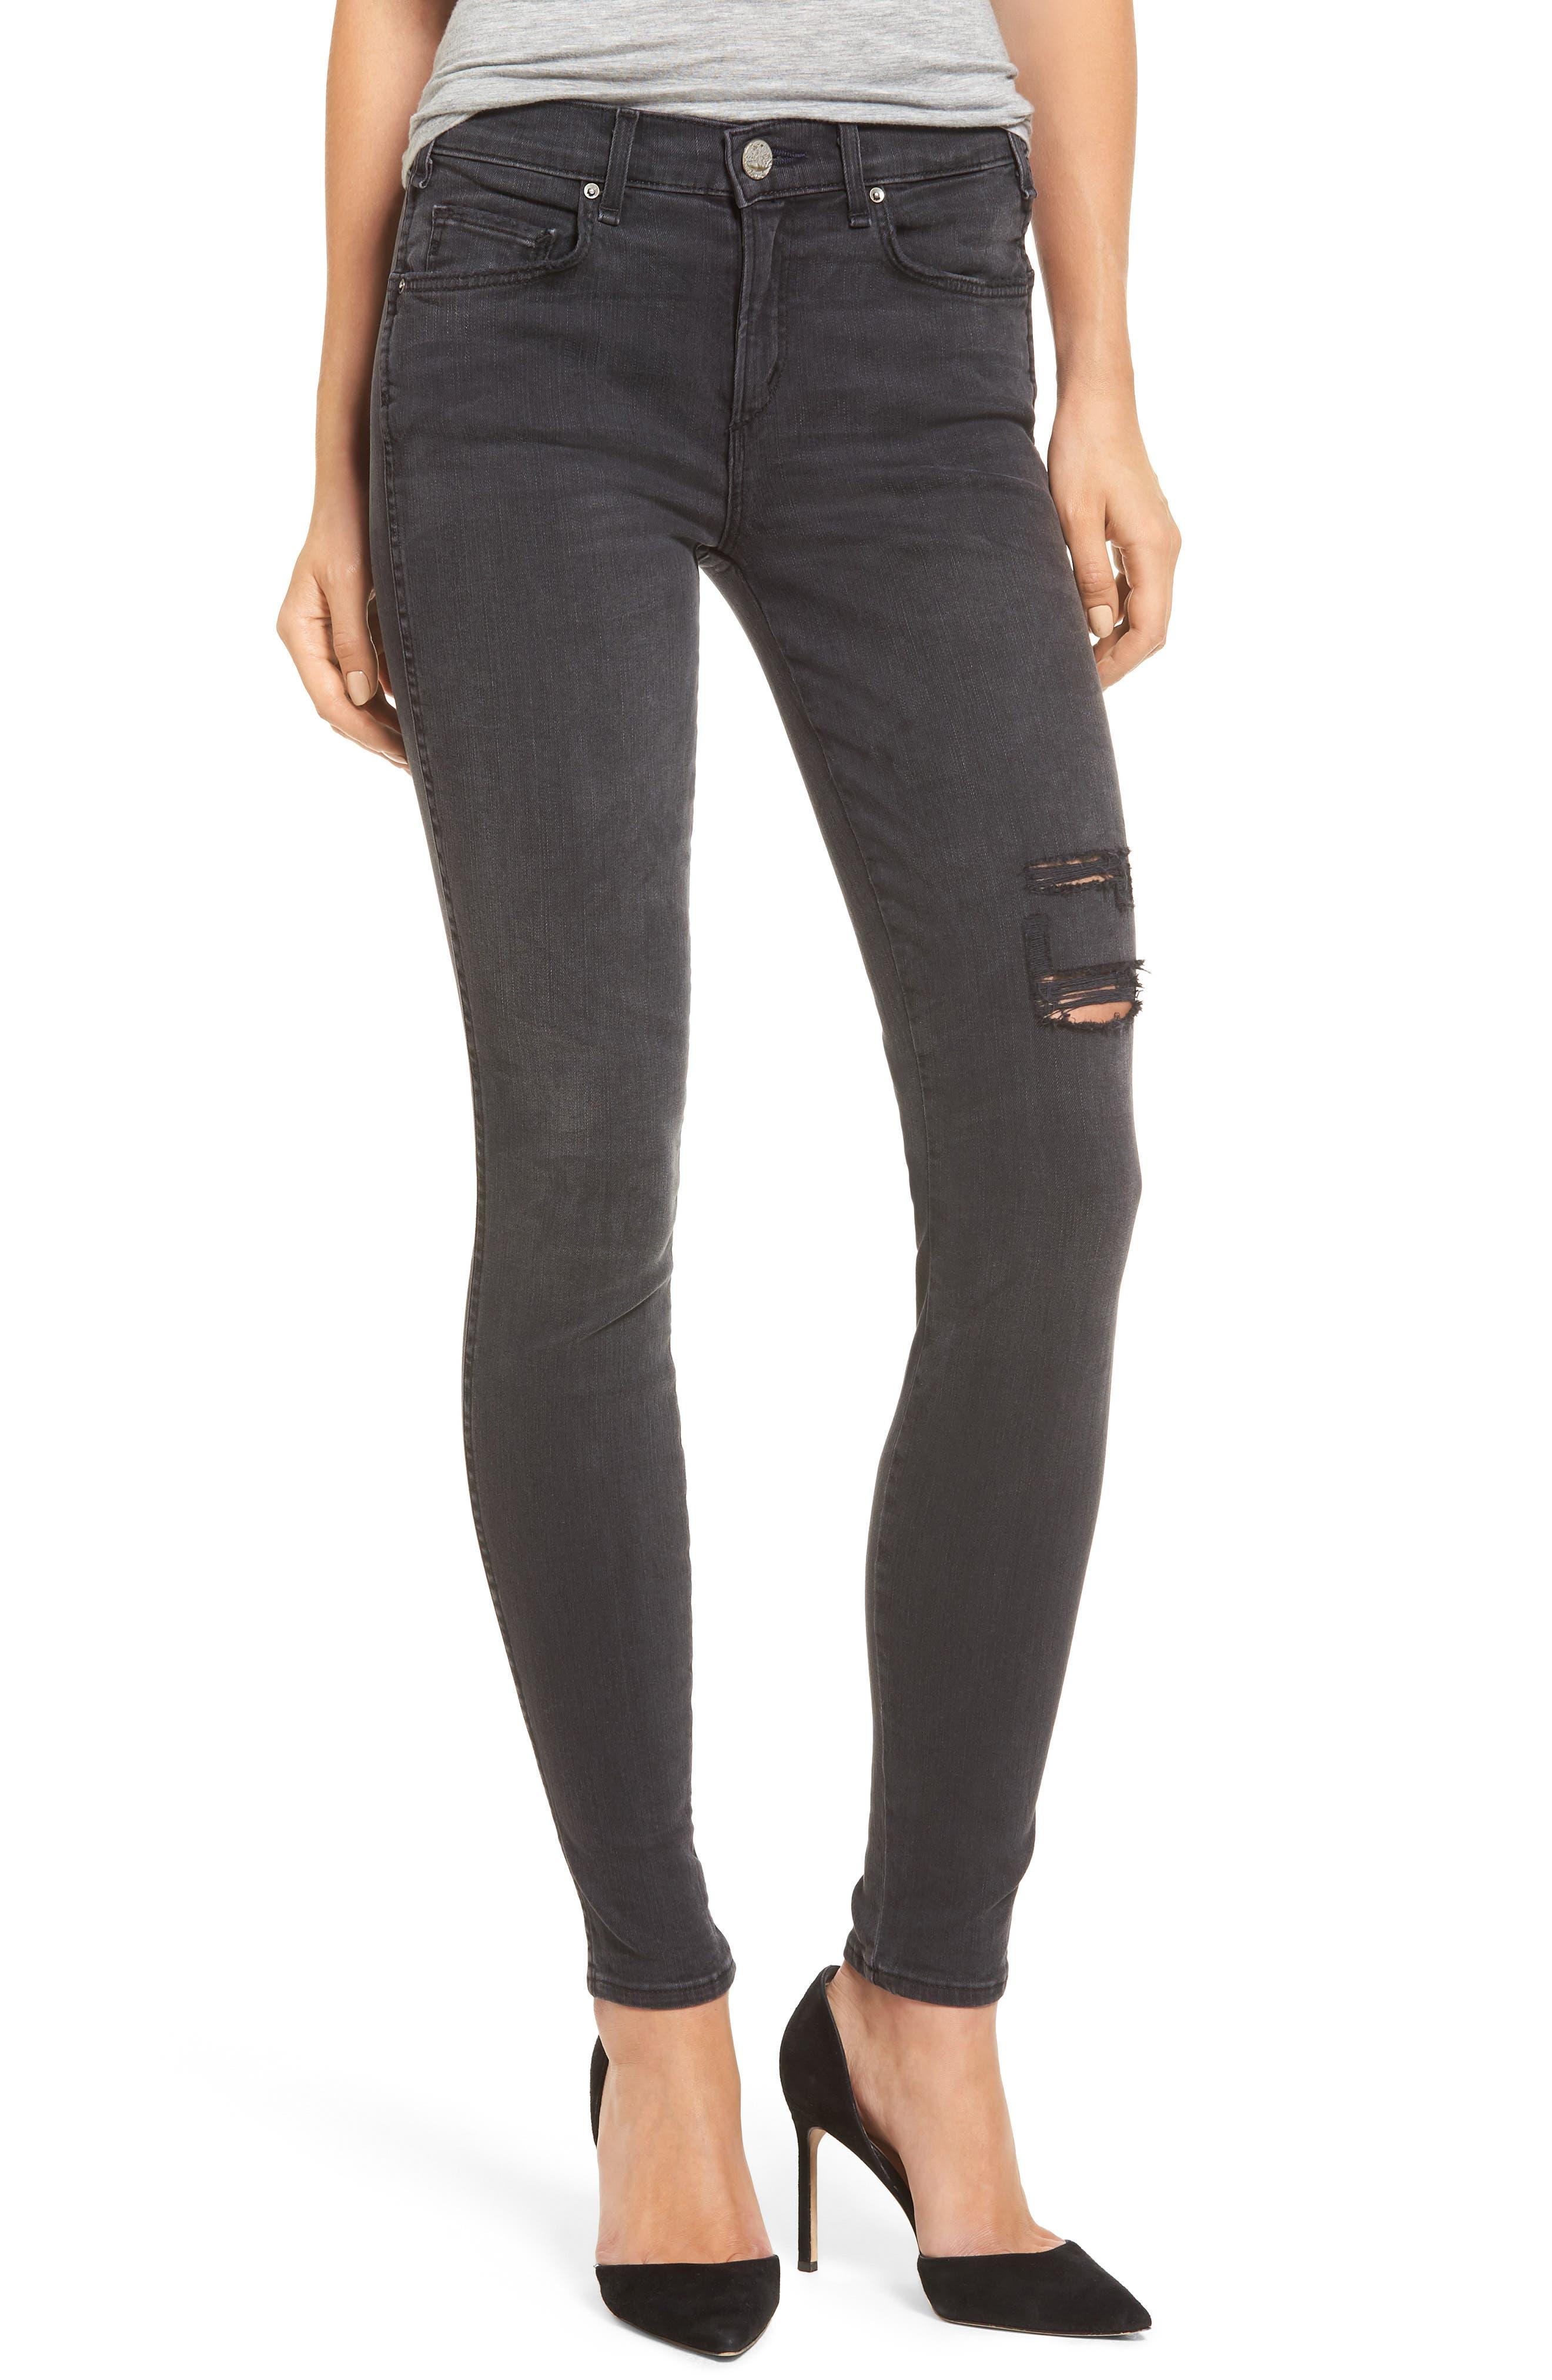 Newton Skinny Jeans,                             Main thumbnail 1, color,                             011